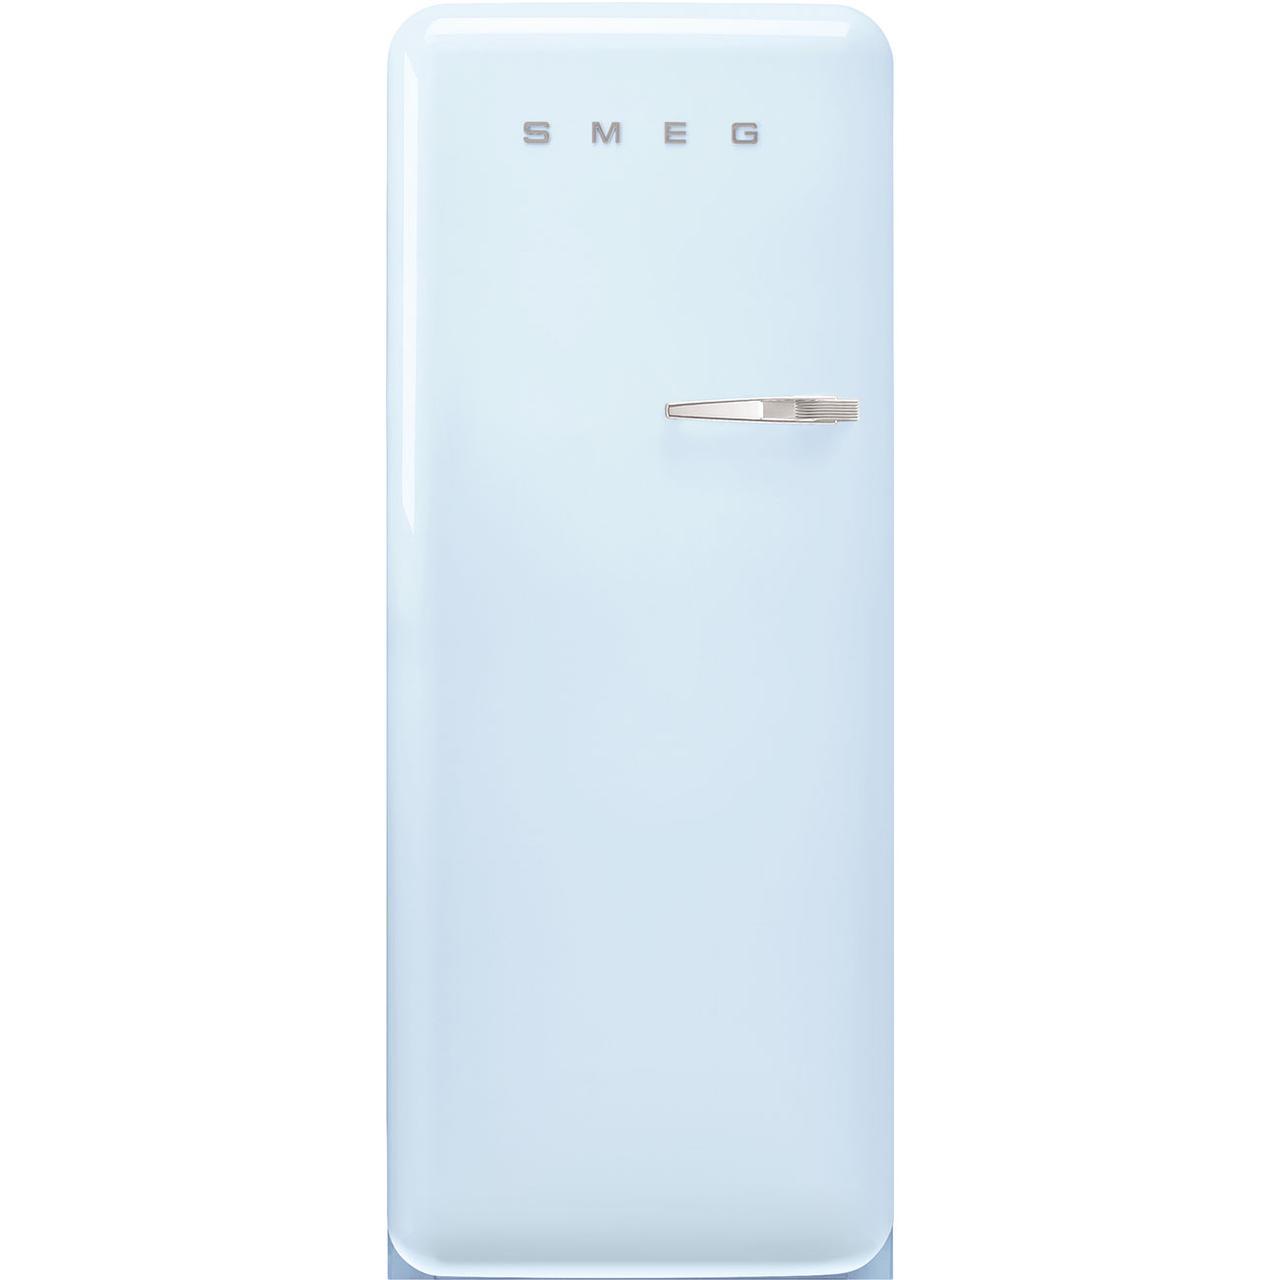 Холодильник Smeg FAB28LPB5, FAB28LPB5, FAB28RPG5, FAB28LPG